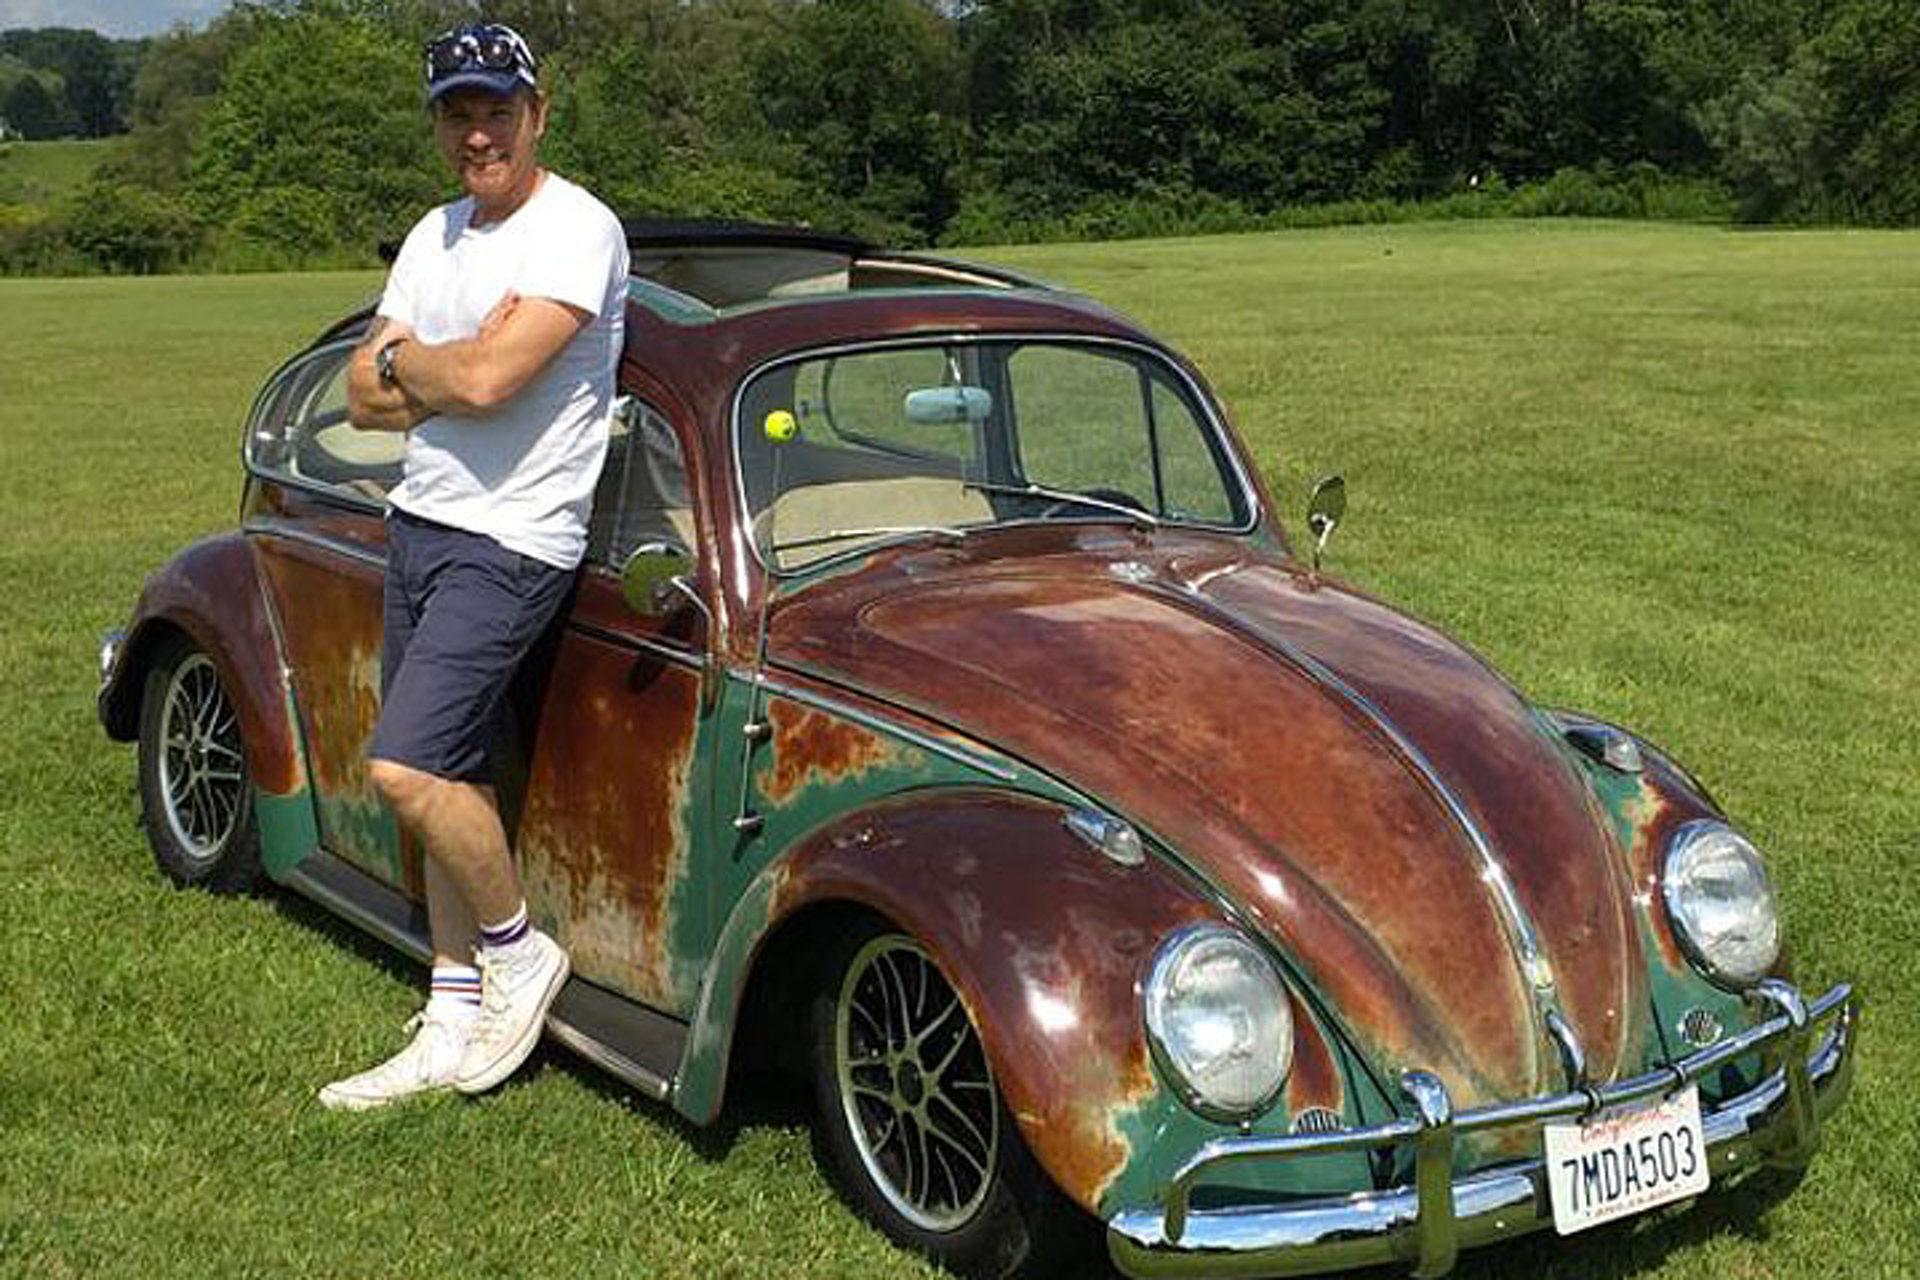 atl convertible volkswagen ebay hd itm beetle streetside bugs classic classics